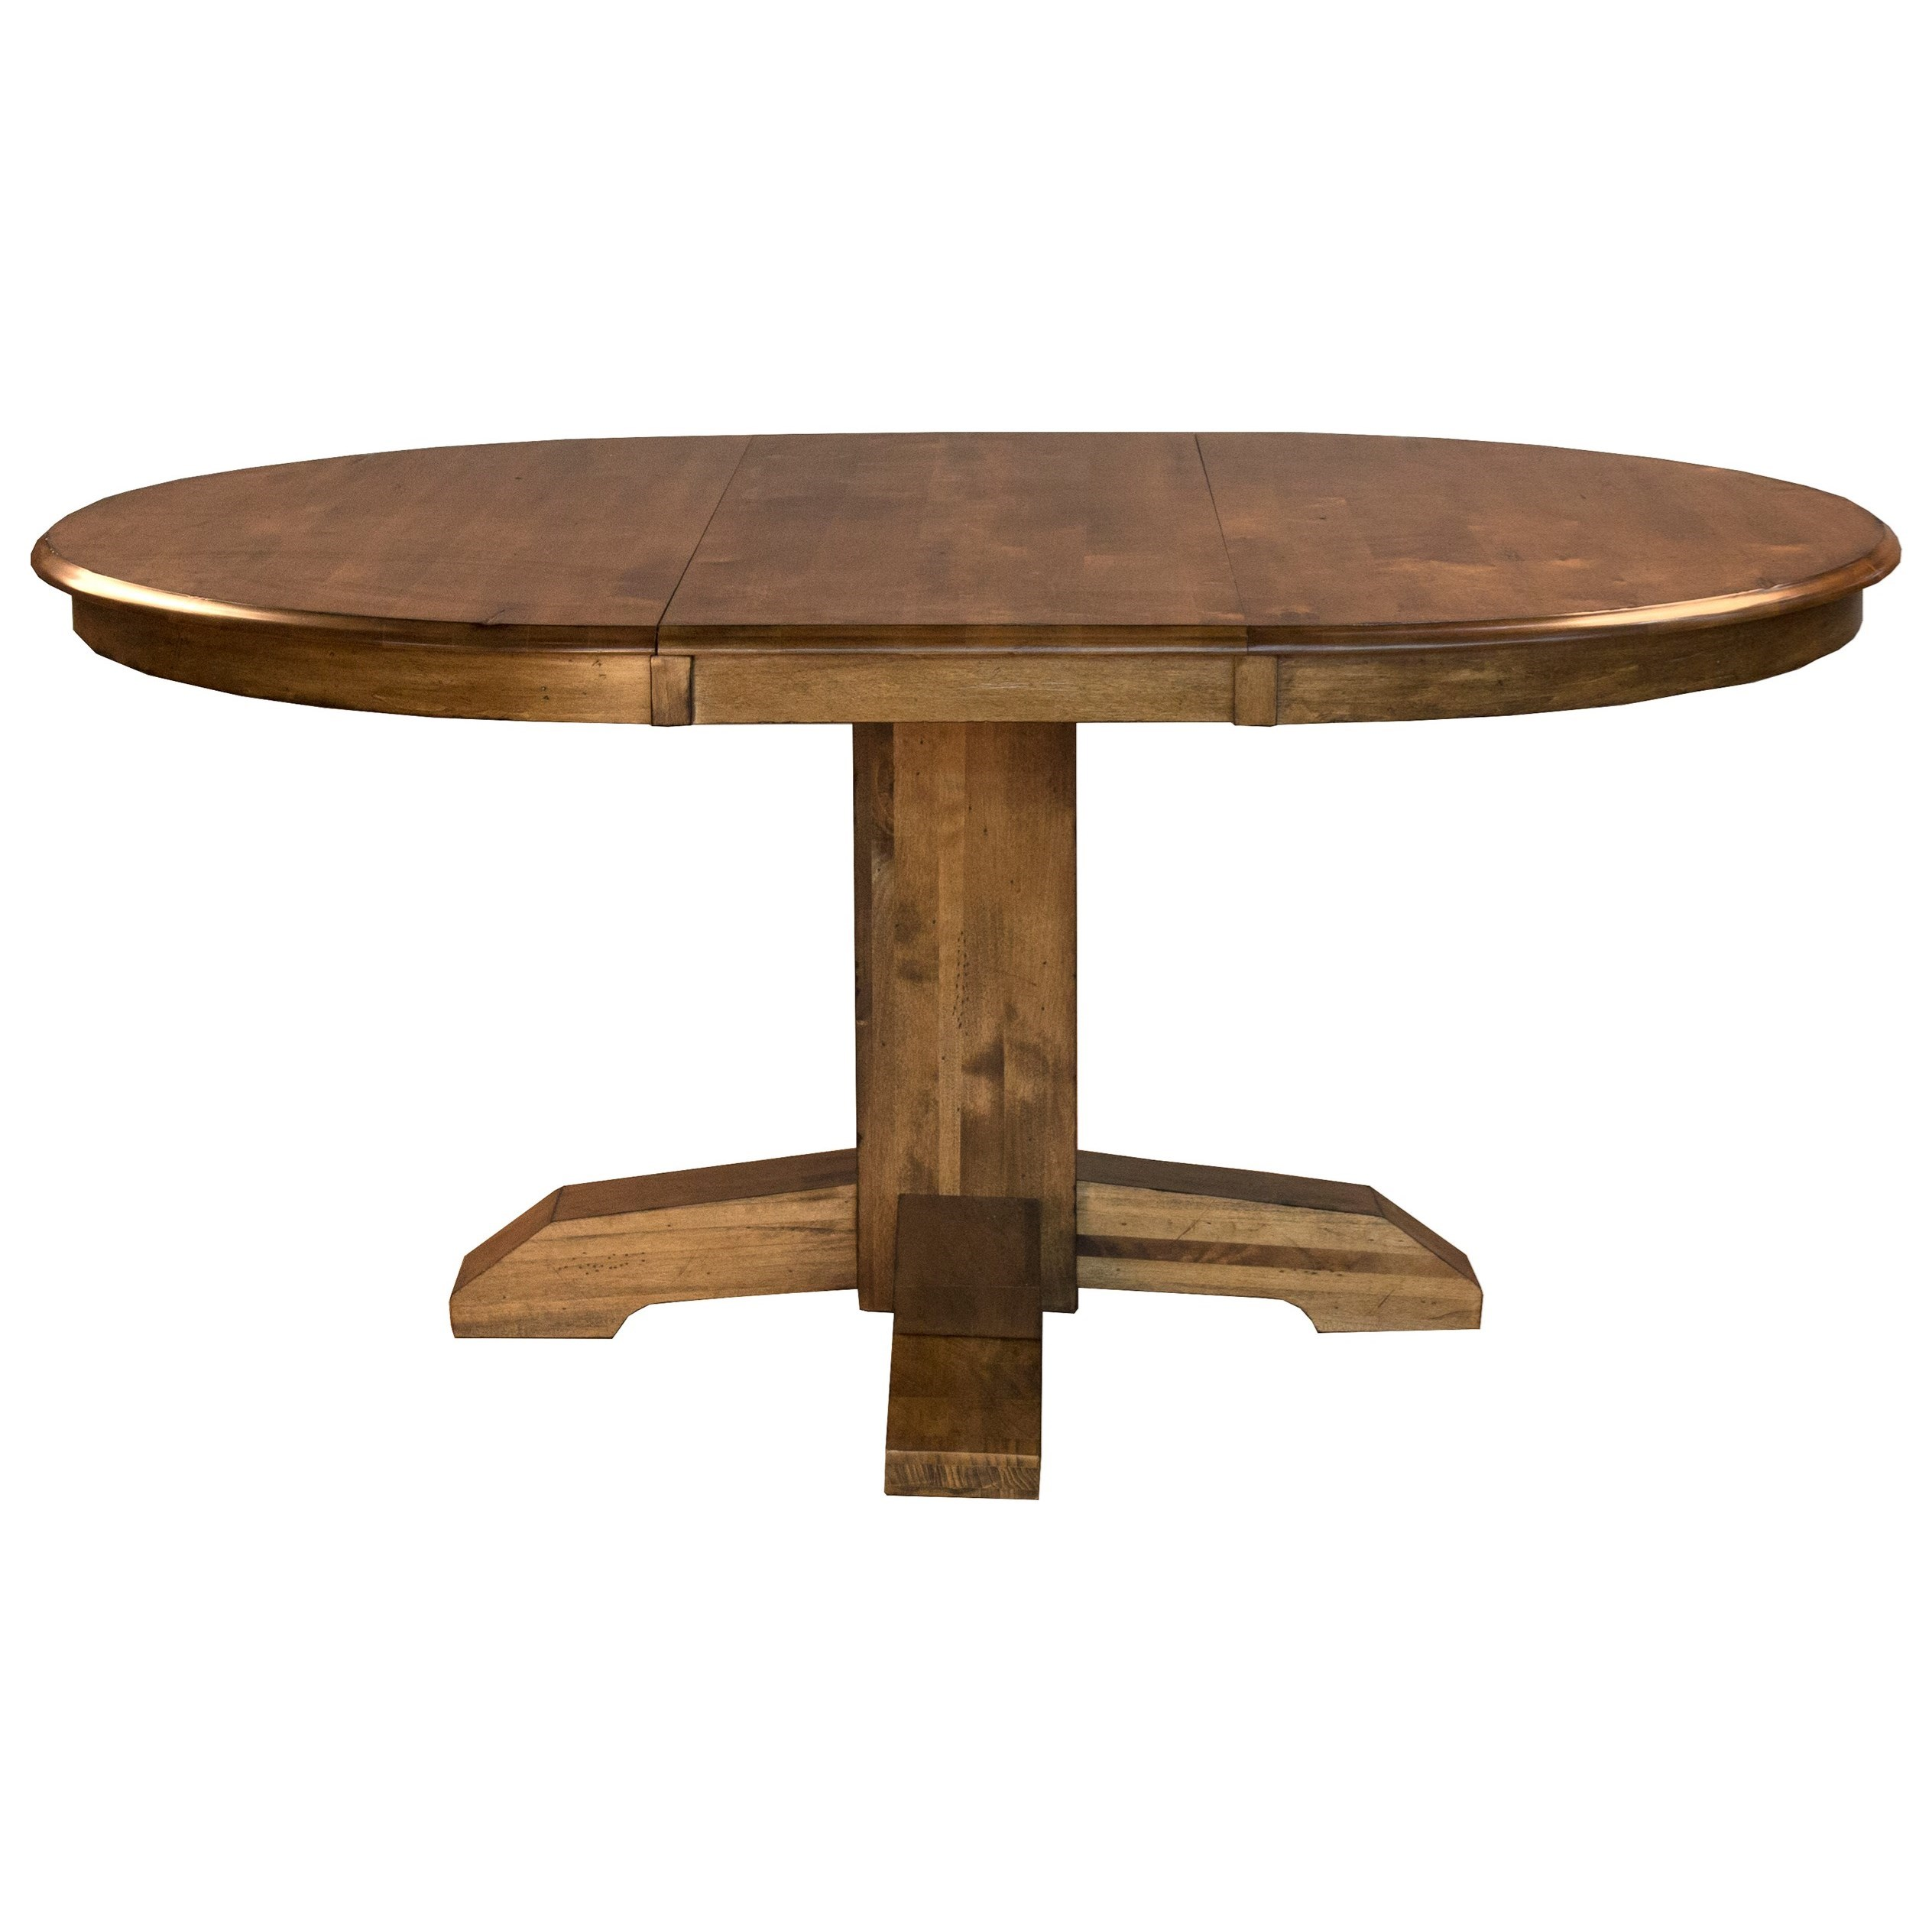 "Bennett 48"" Pedestal Table by A-A at Walker's Furniture"